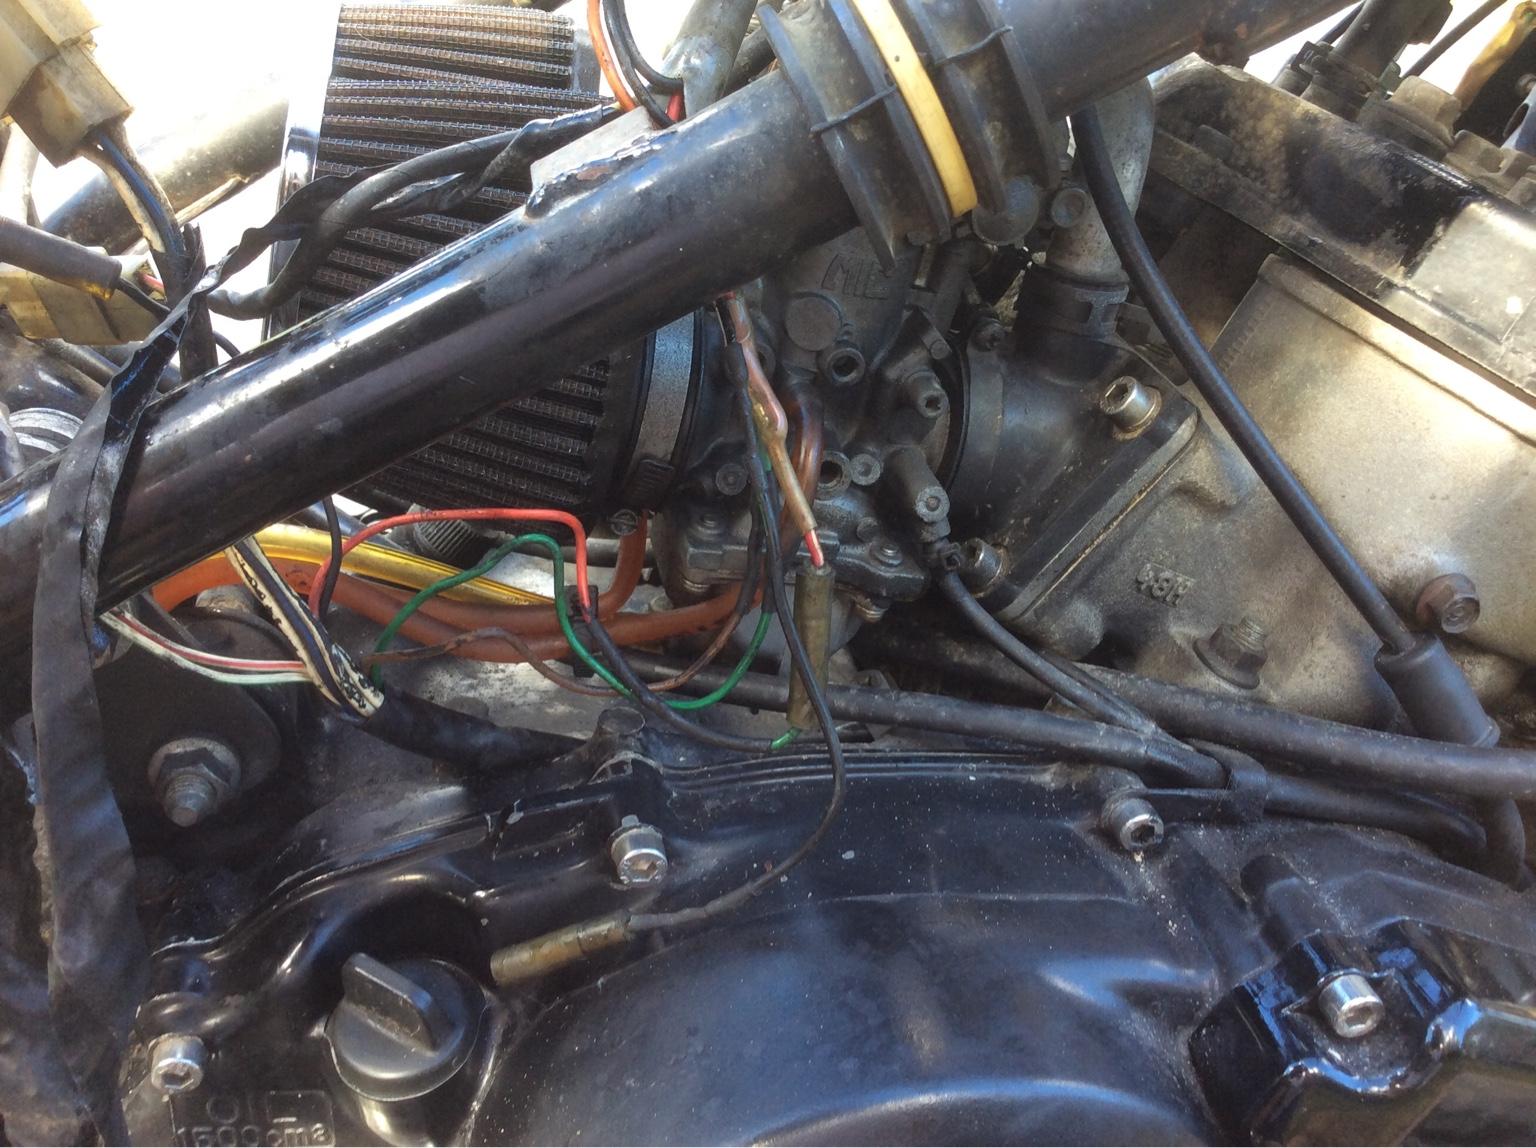 85 Rz350 No Spark Wiring Hell Rz Rd 350 Misc 2 Stroke Tech Bbs Aprilia Rs250